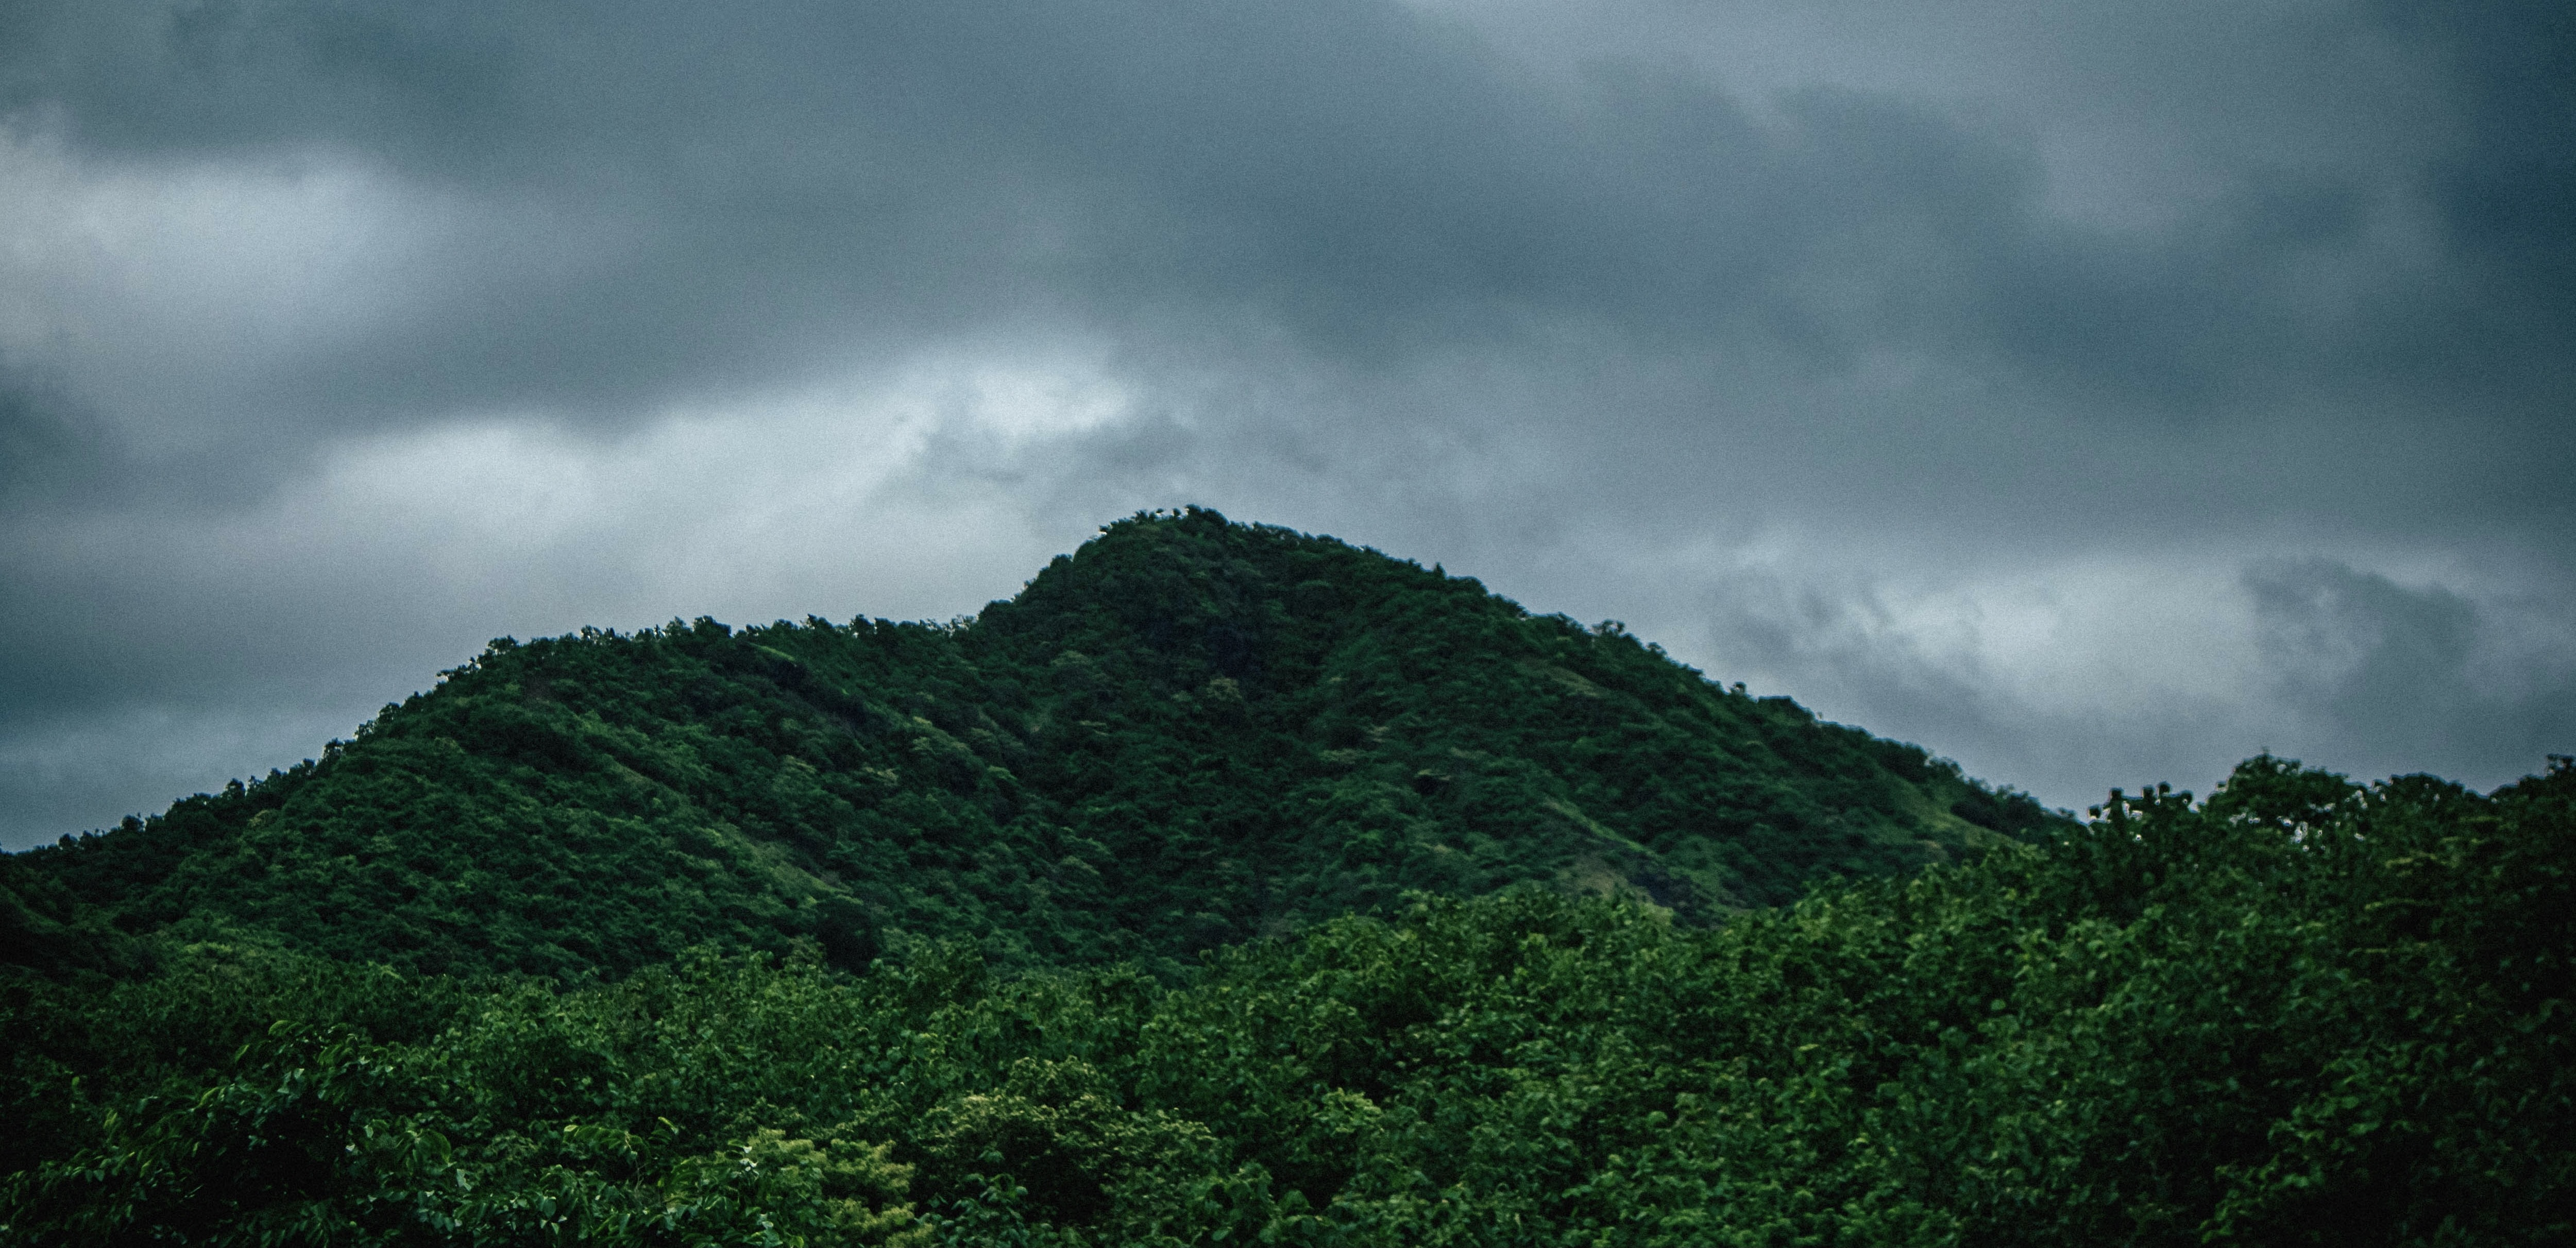 Mountain during monsoon